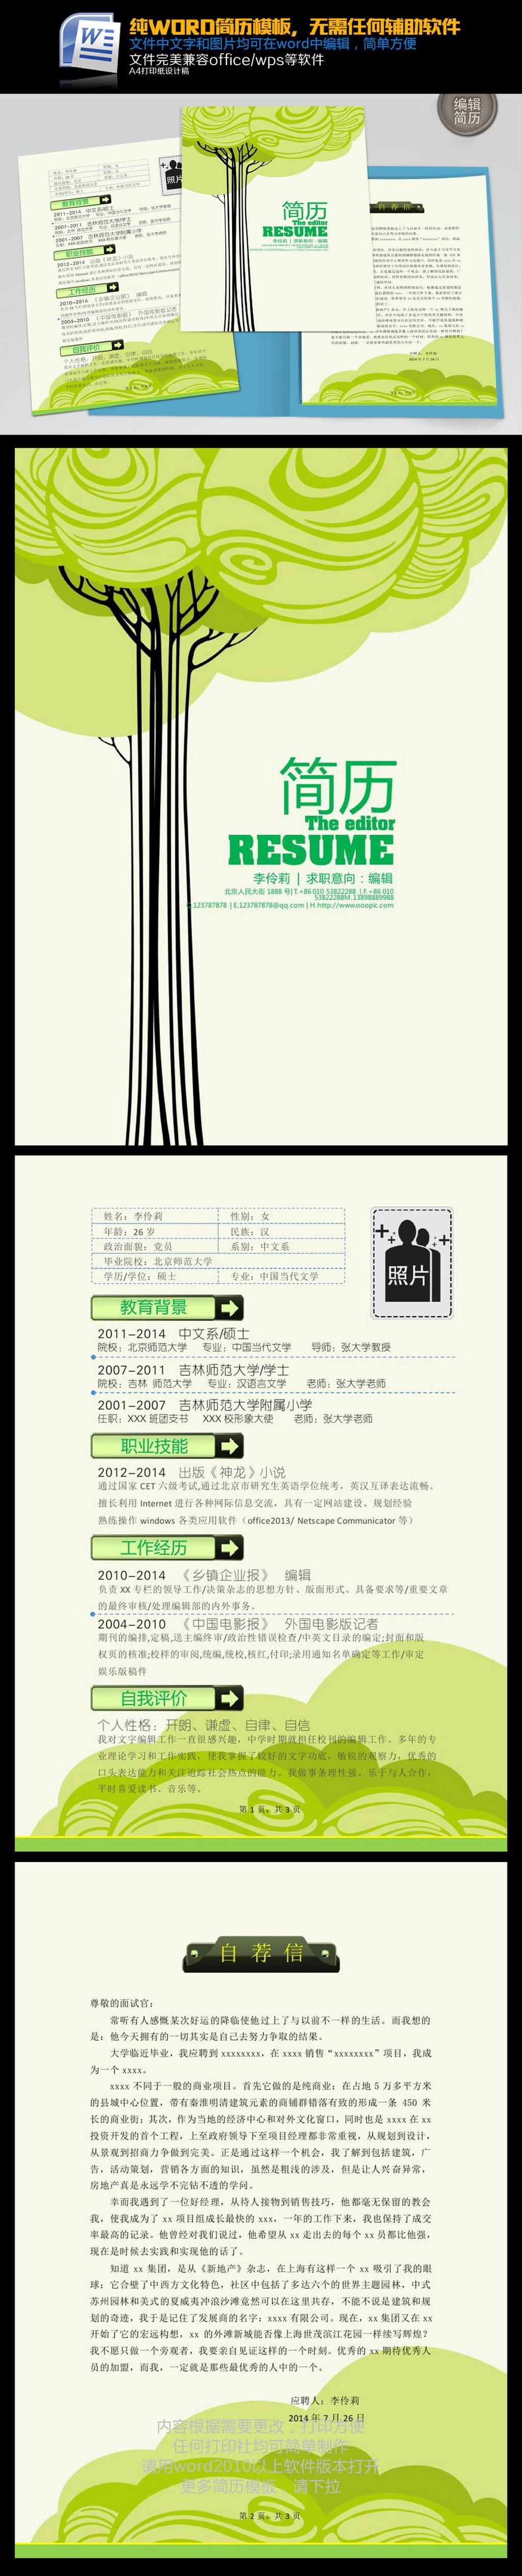 word幼师女生秘书翻译树简历模板下载